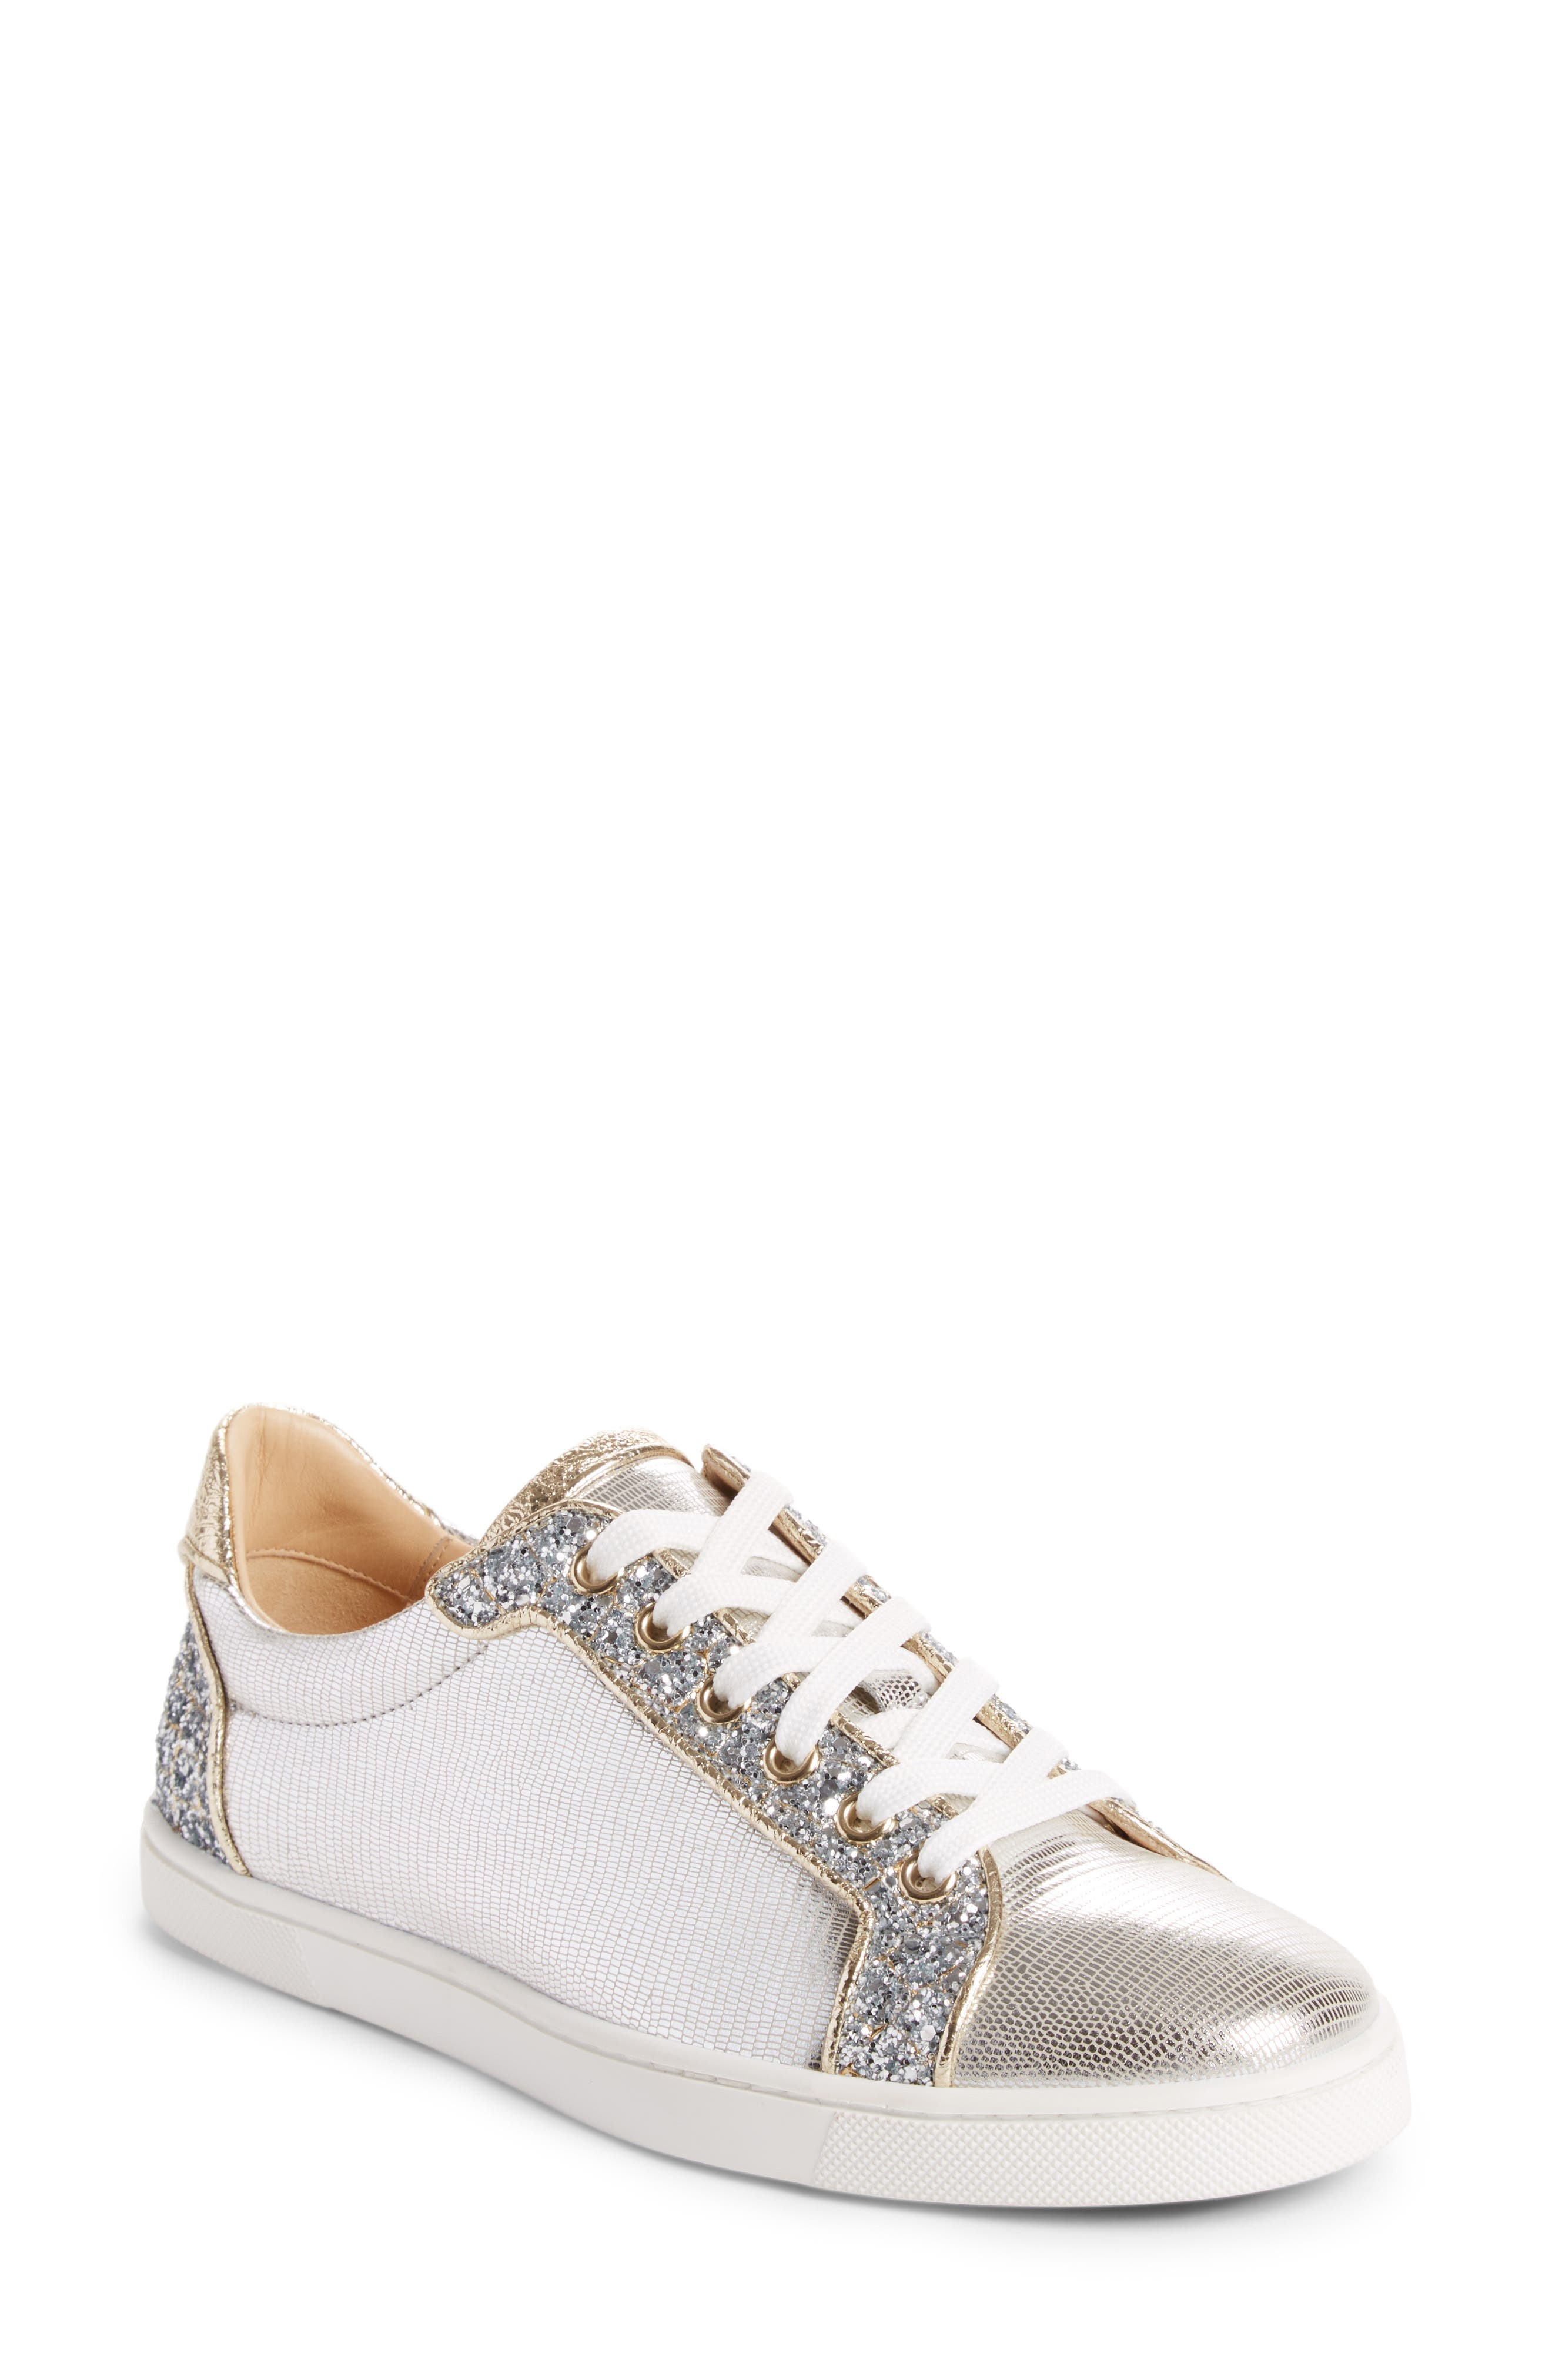 Christian Louboutin Seava Embellished Lizardskin Embossed Sneaker (Women)